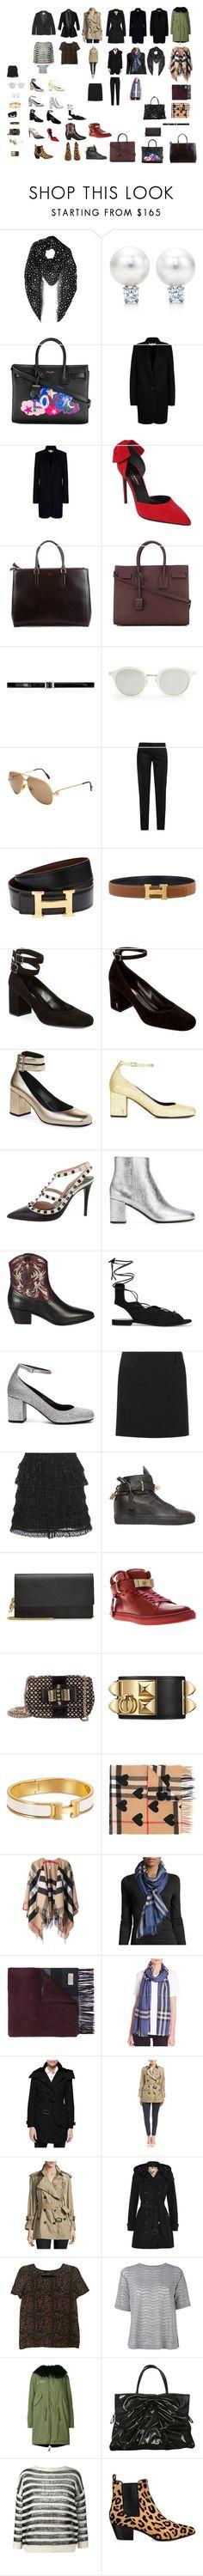 """Wardrobe"" by ivymind on Polyvore featuring Mode, Yves Saint Laurent, STELLA McCARTNEY, Anya Hindmarch, Cartier, Hermès, Valentino, Isabel Marant, BUSCEMI und Alexander McQueen"